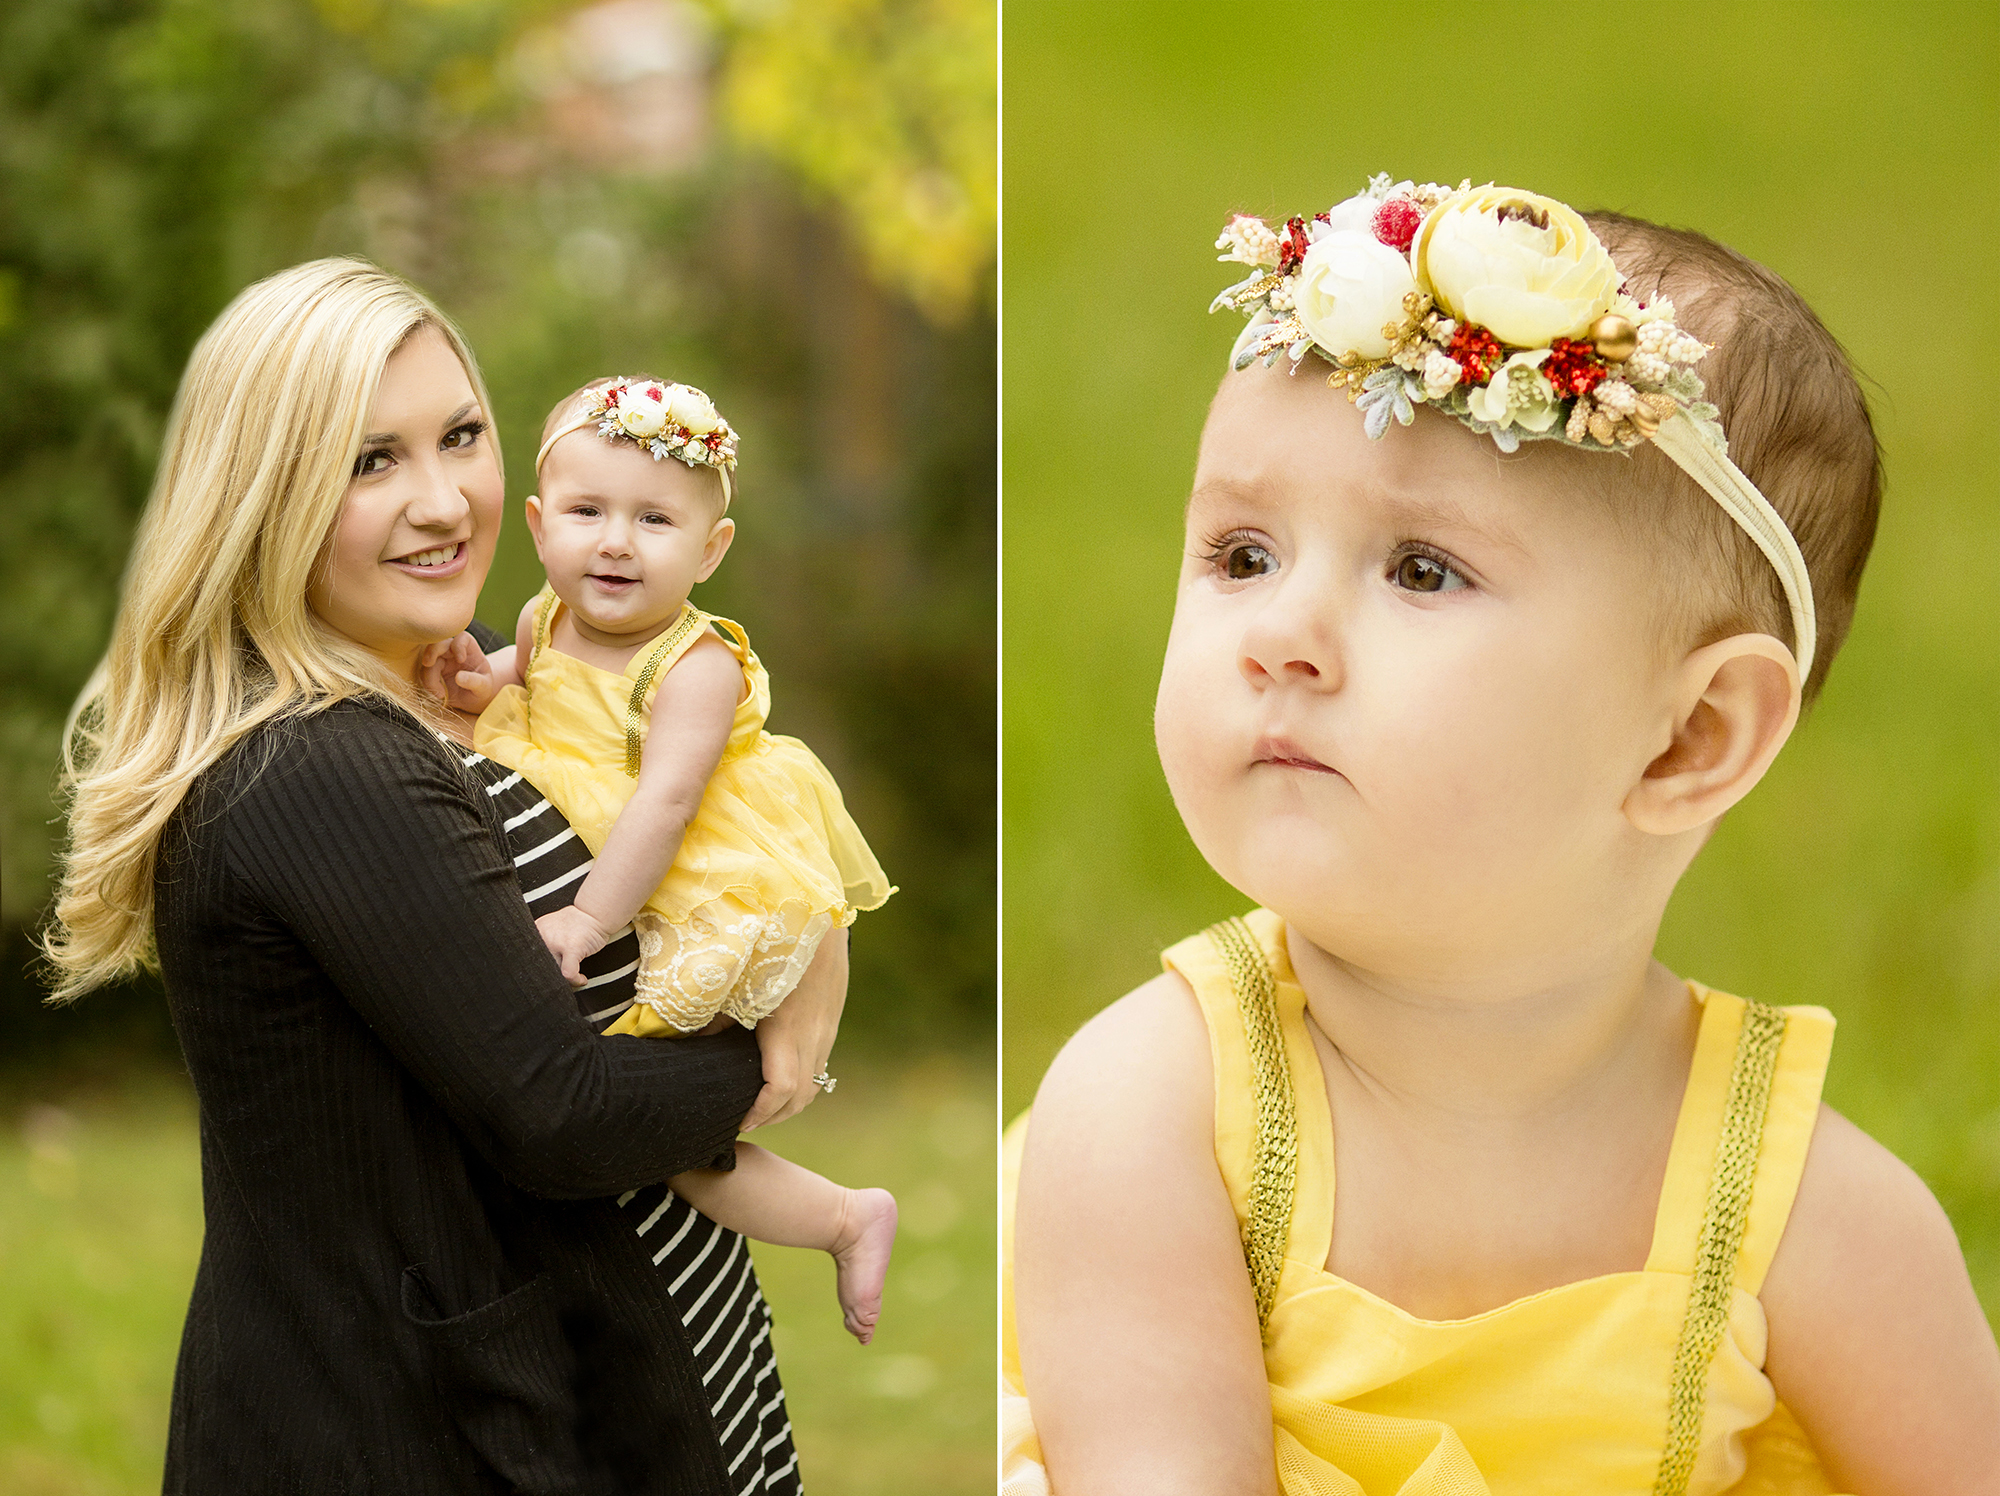 Seriously_Sabrina_Photography_Ashland_Kentucky_Family_Portraits_FanninReynolds3.jpg